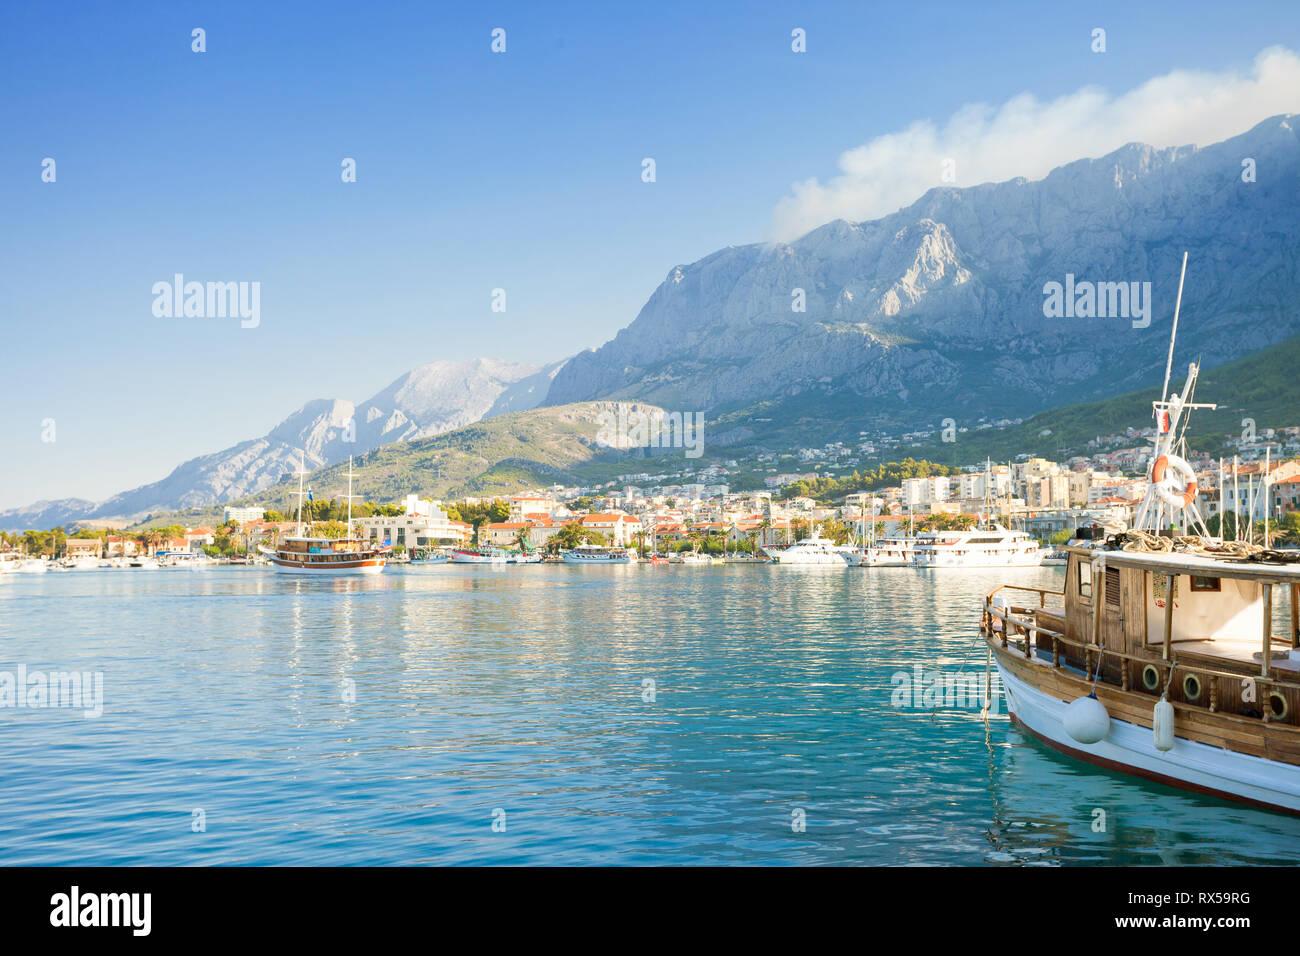 Makarska, Dalmatia, Croatia, Europe - Setting sail from the harbor of Makarska Stock Photo